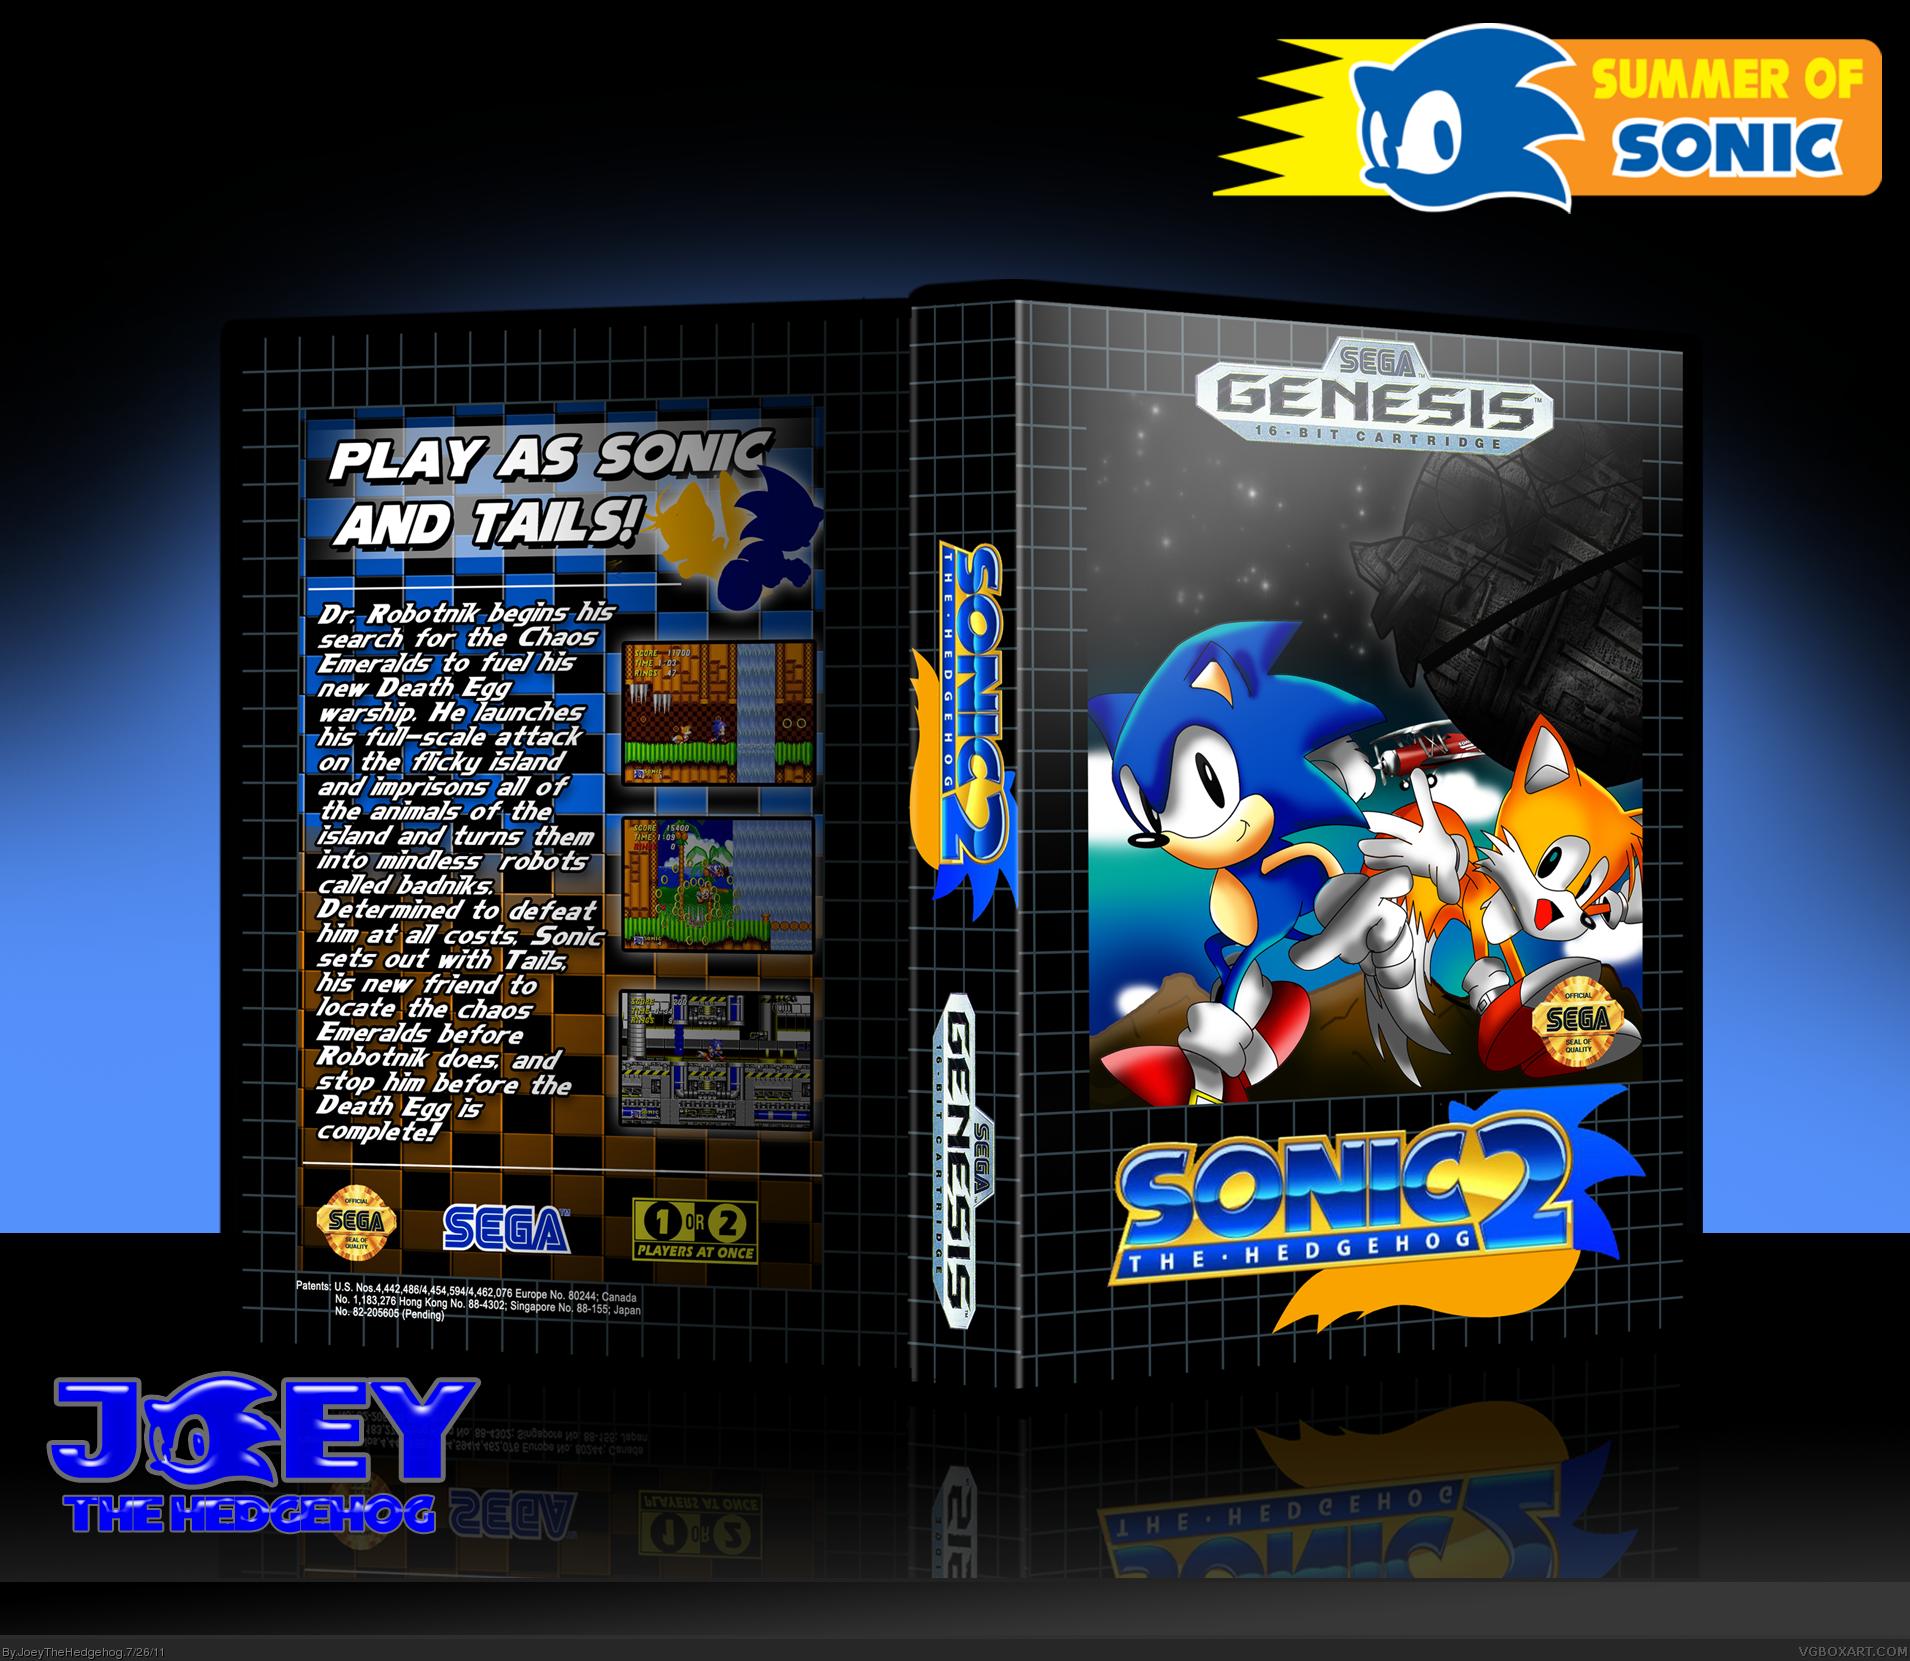 Sonic The Hedgehog 2 Genesis Box Art Cover By Joeythehedgehog